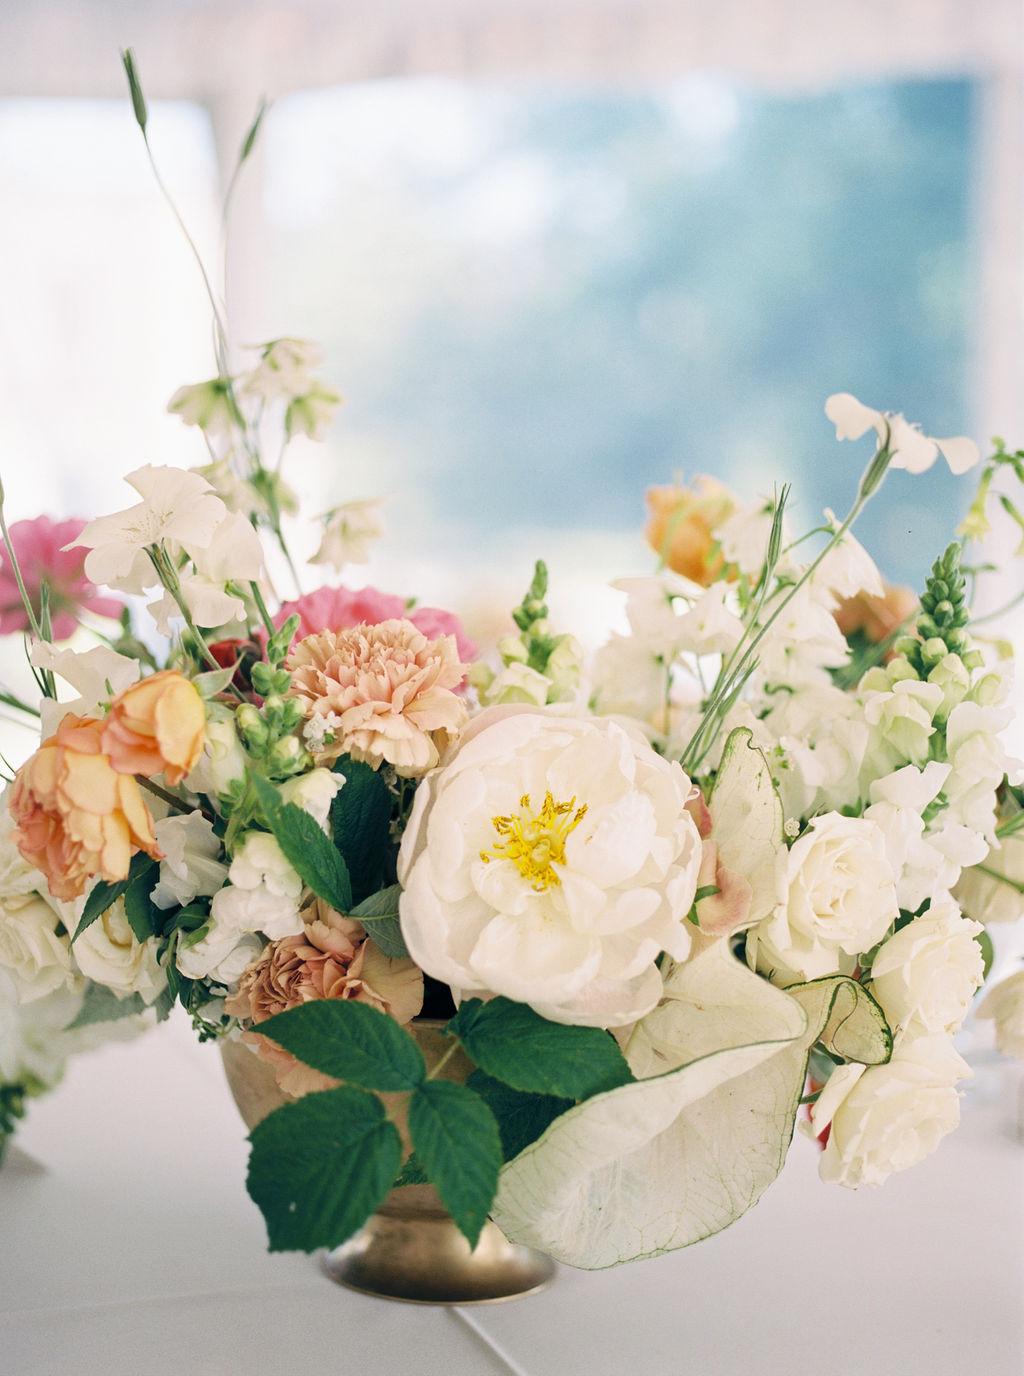 Alexandra-Elise-Photography-Film-Wedding-Photographer-Sonnenberg-Gardens-Finger-Lakes-Canandaigua-Reception-013.jpg